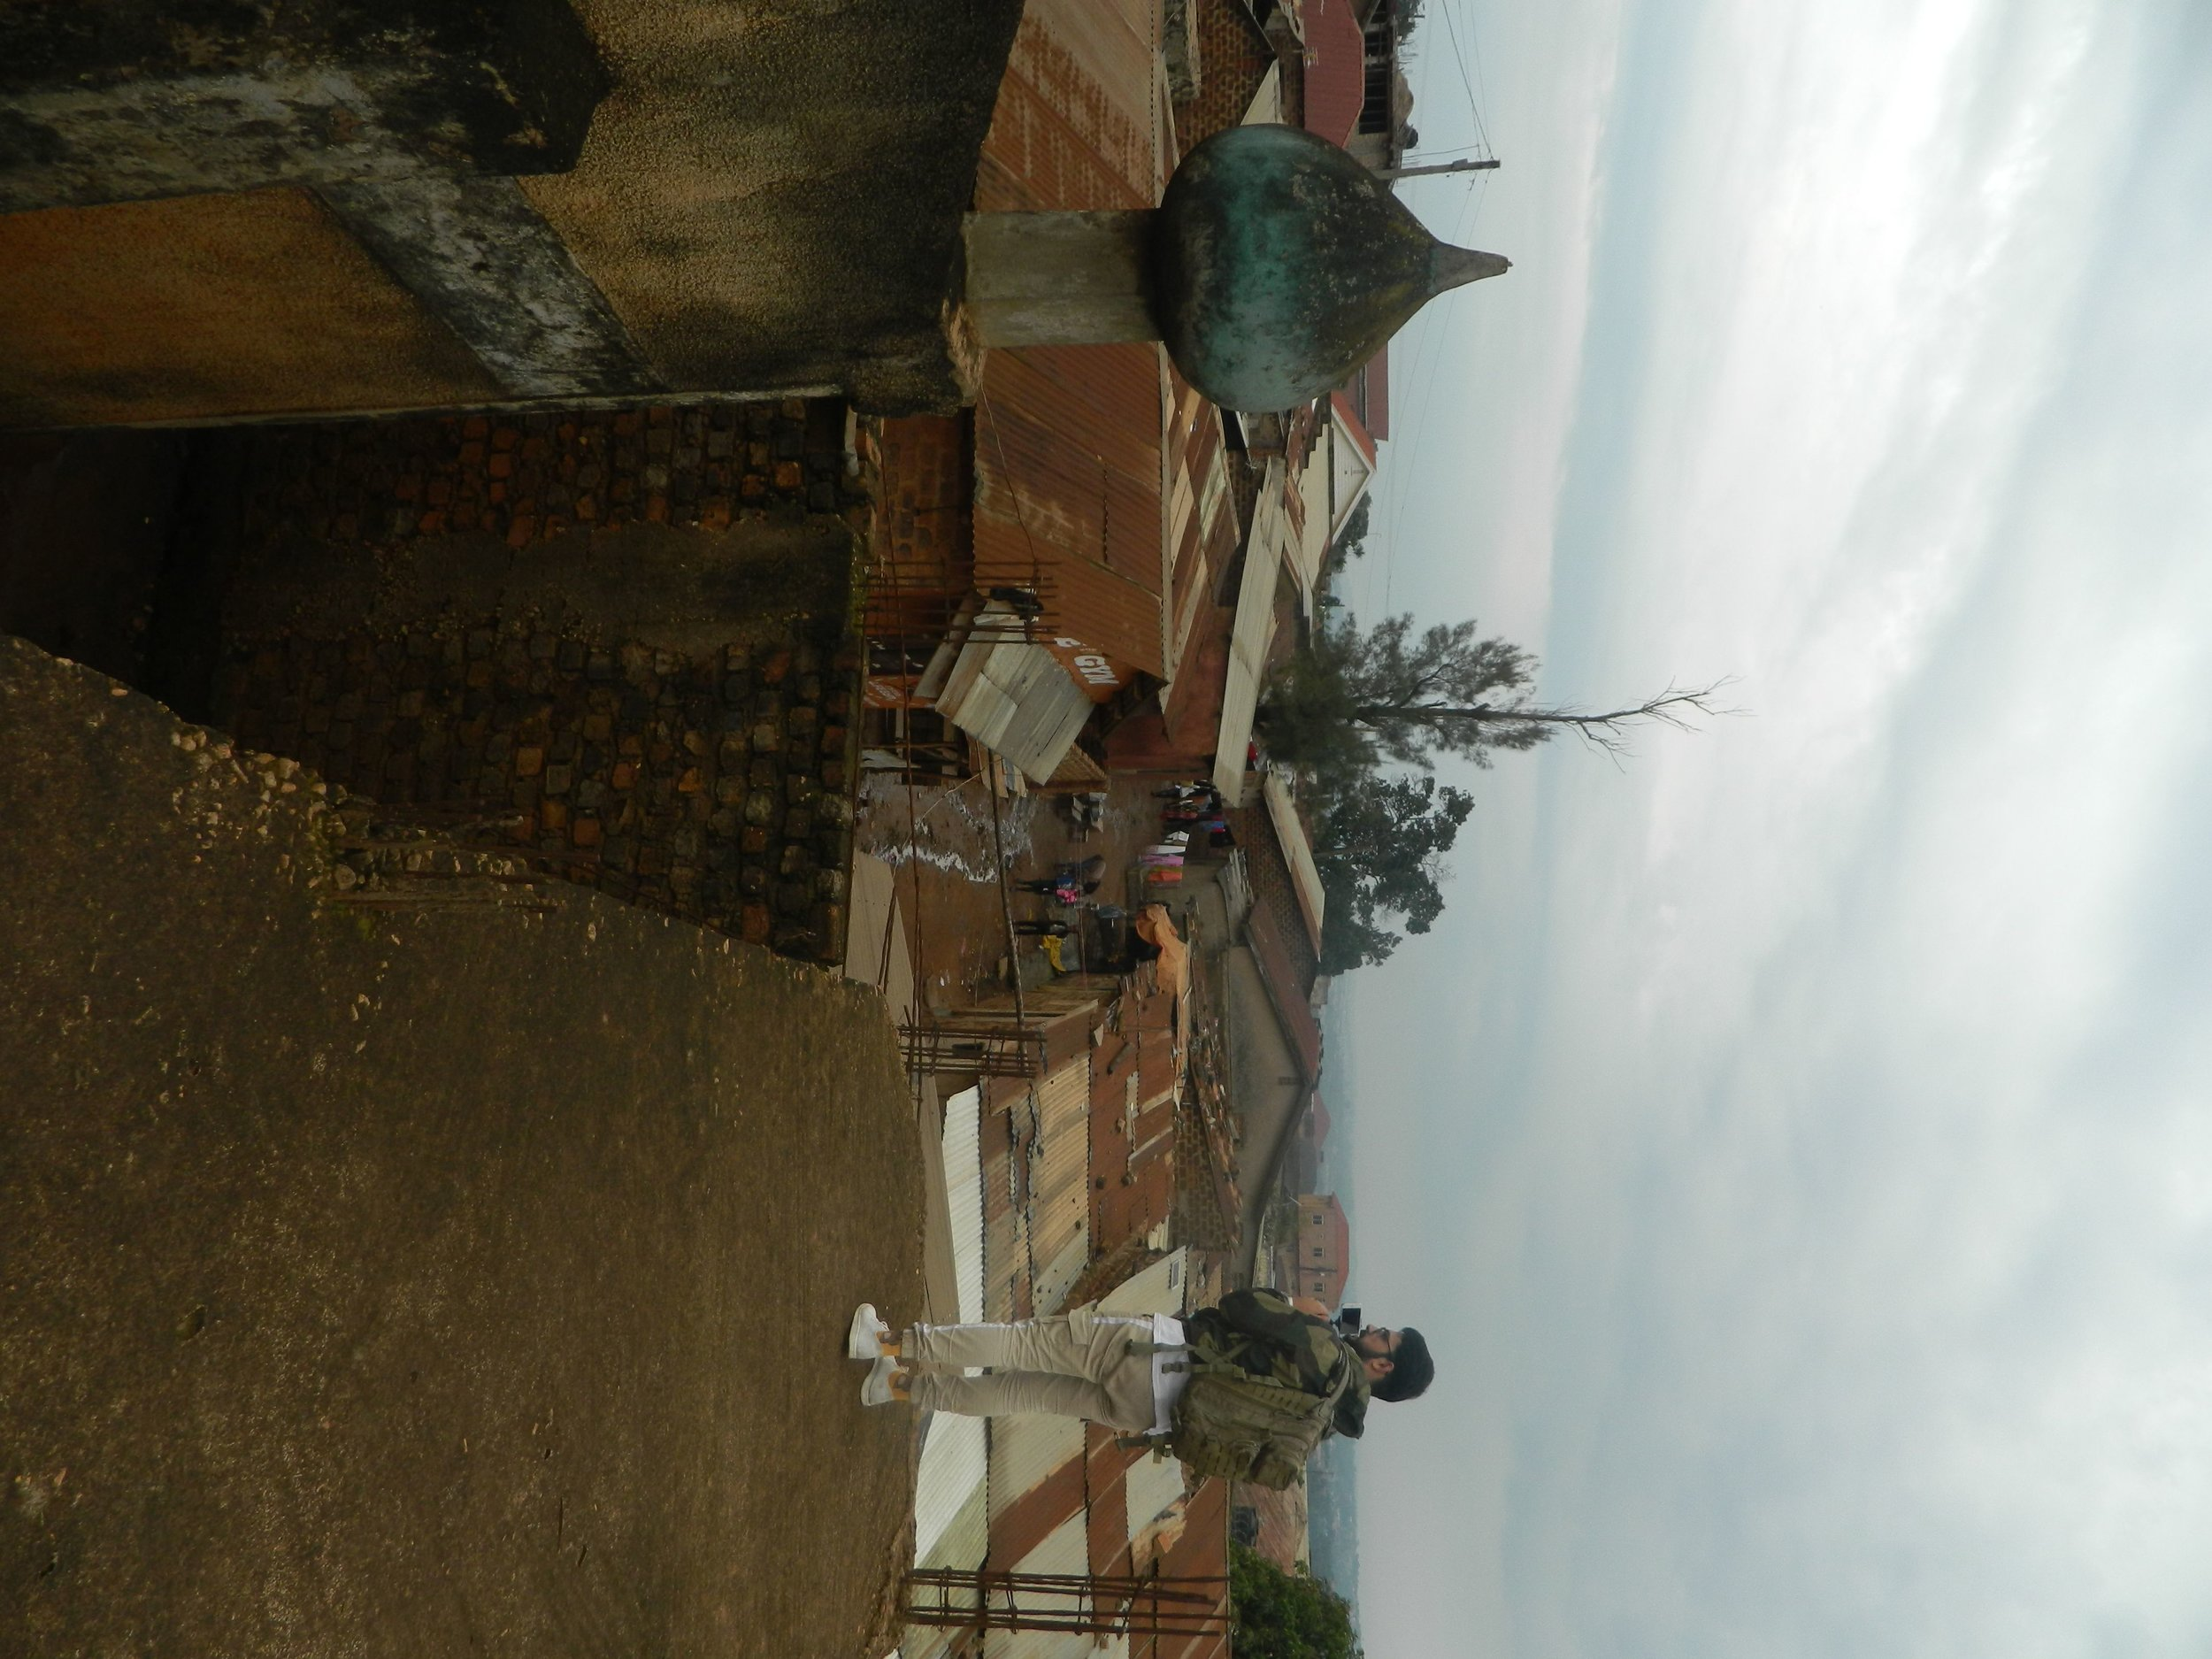 Africa-2325.JPG